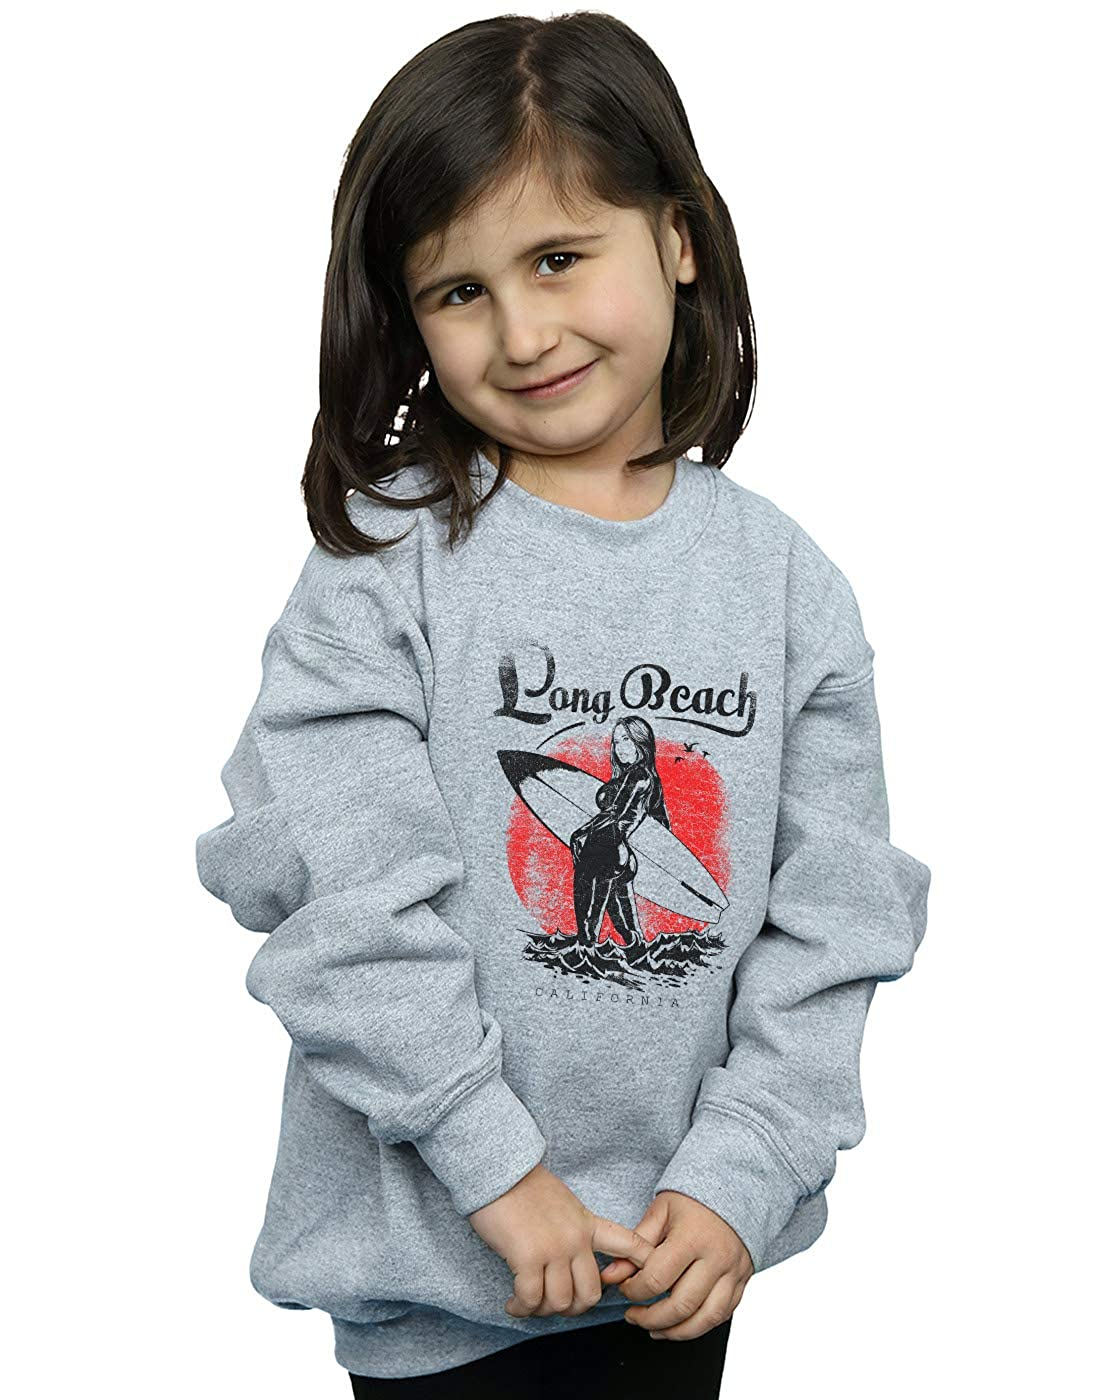 Absolute Cult Drewbacca Girls Long Beach Surfer Sweatshirt